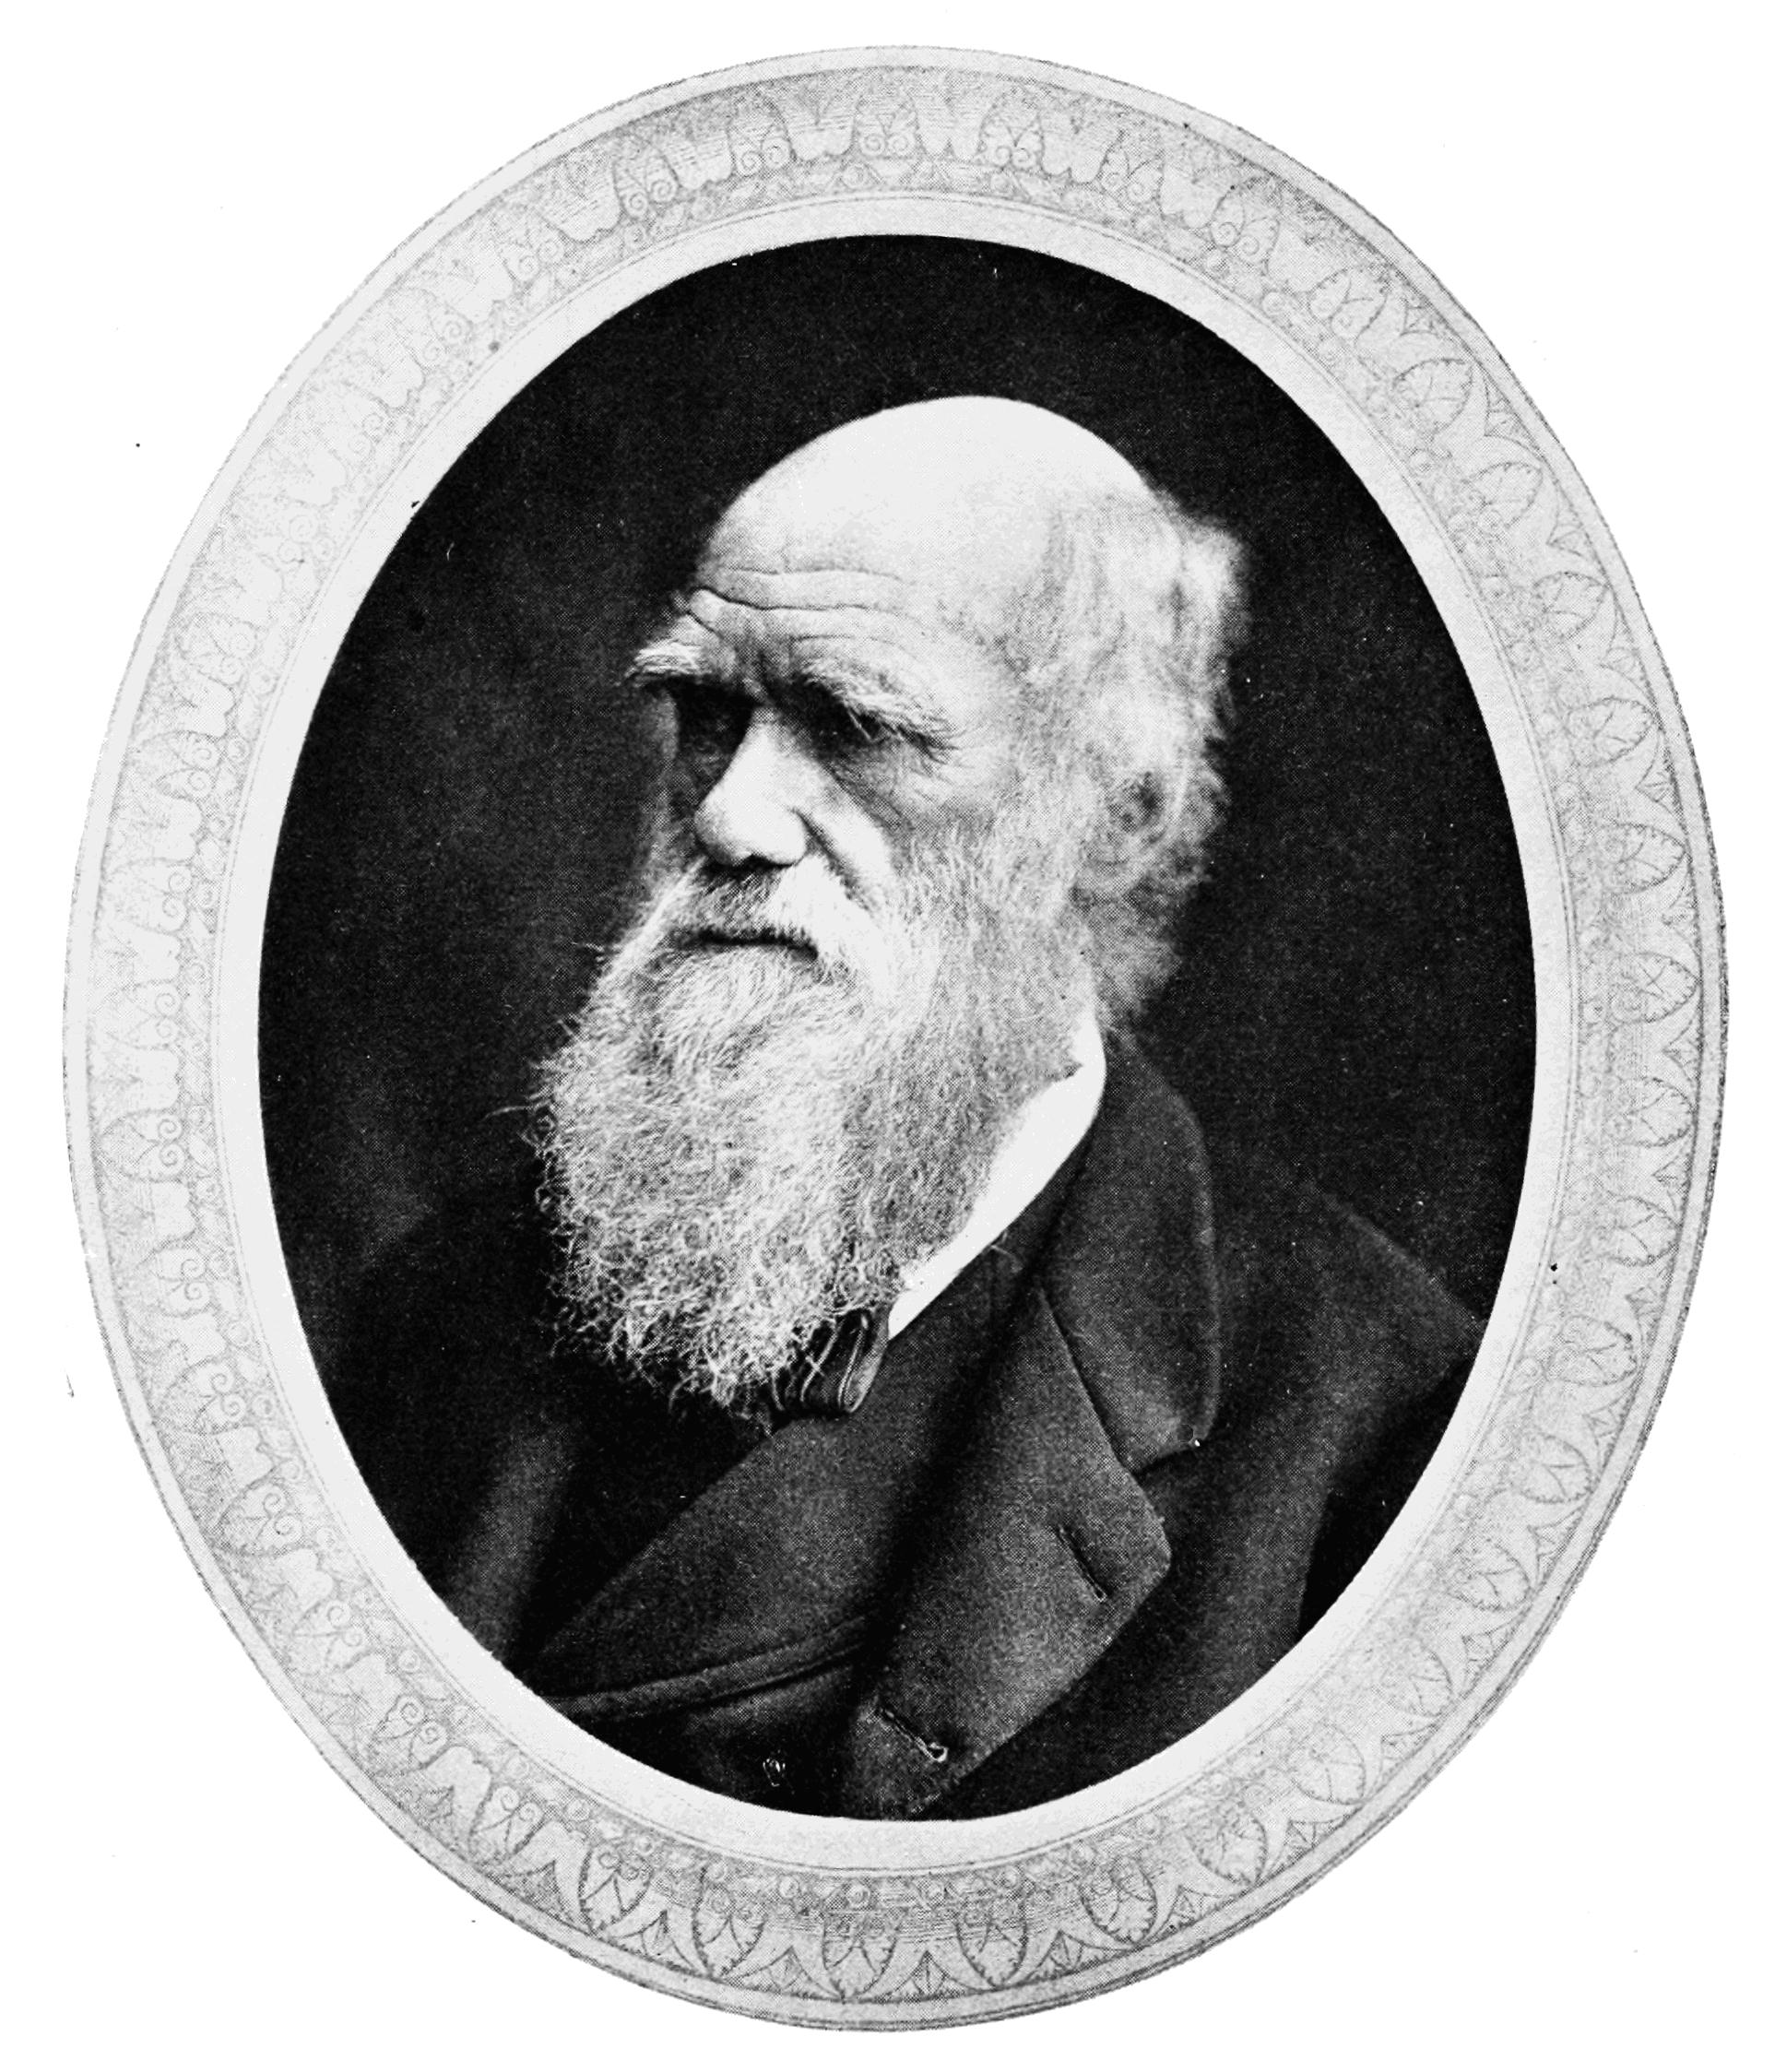 File:PSM V74 D318 Charles Darwin.png.